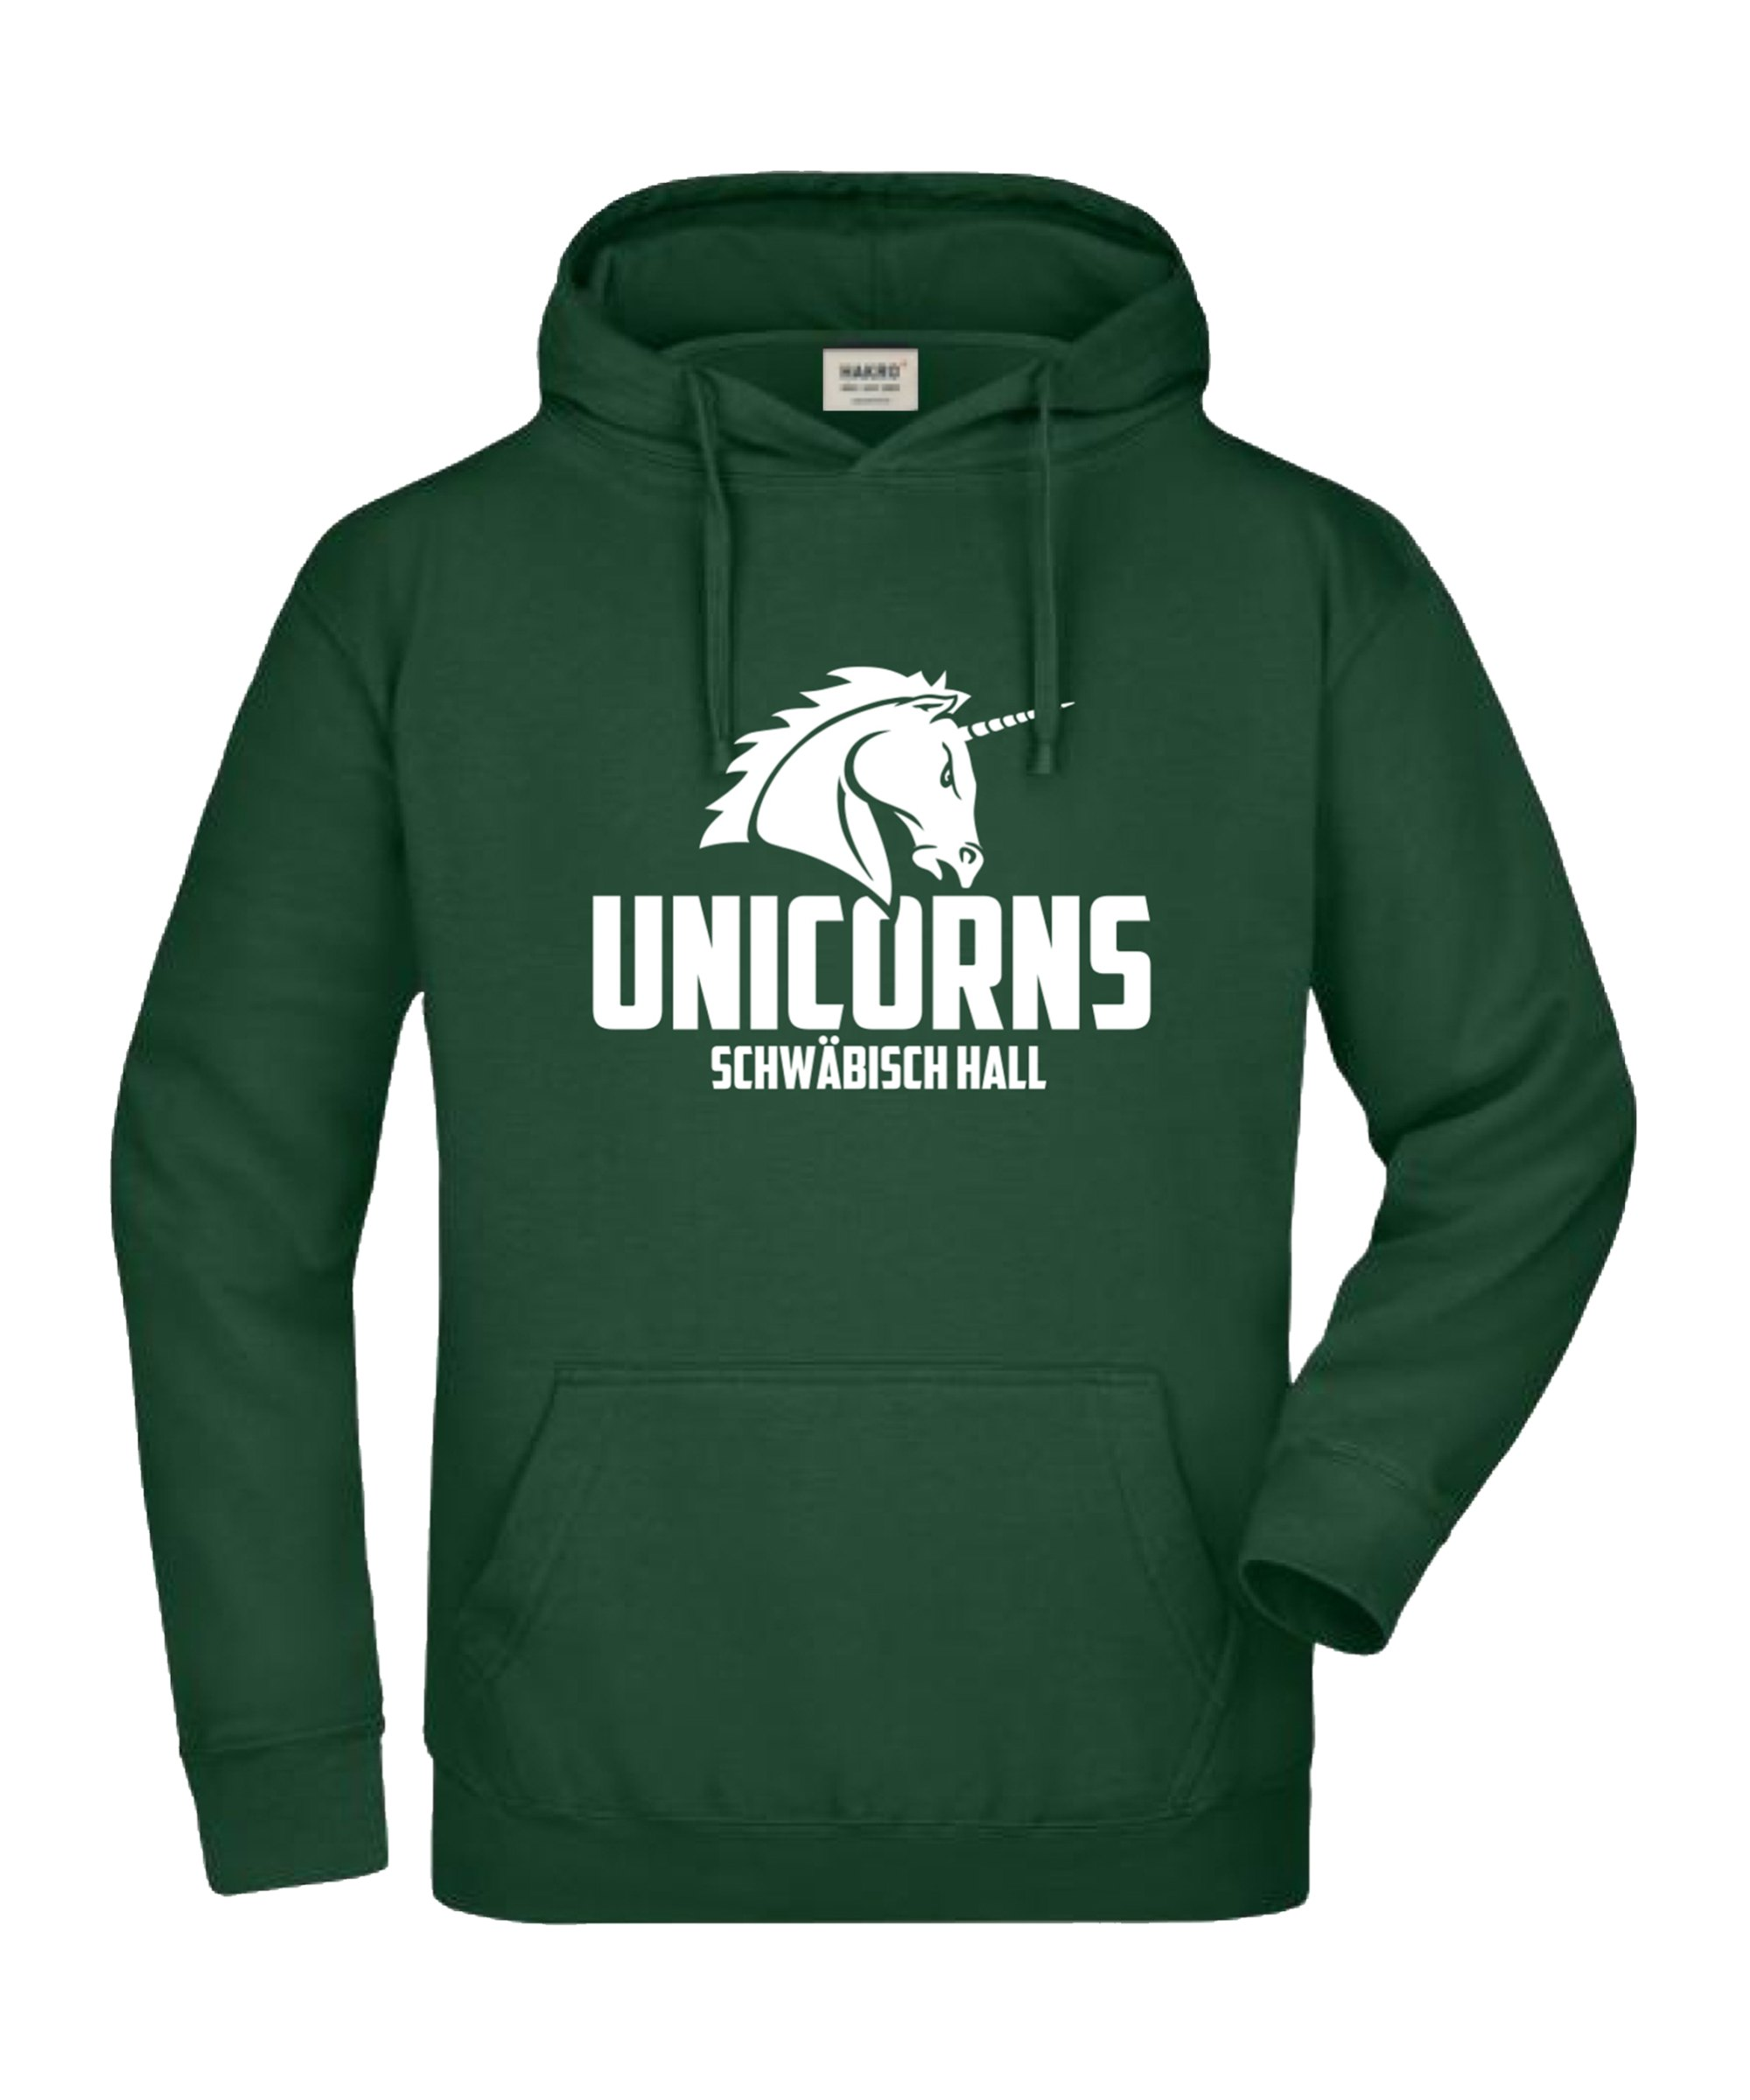 Unicorns Hoody Sweatshirt Premium Schwarz Weiss - schwarz